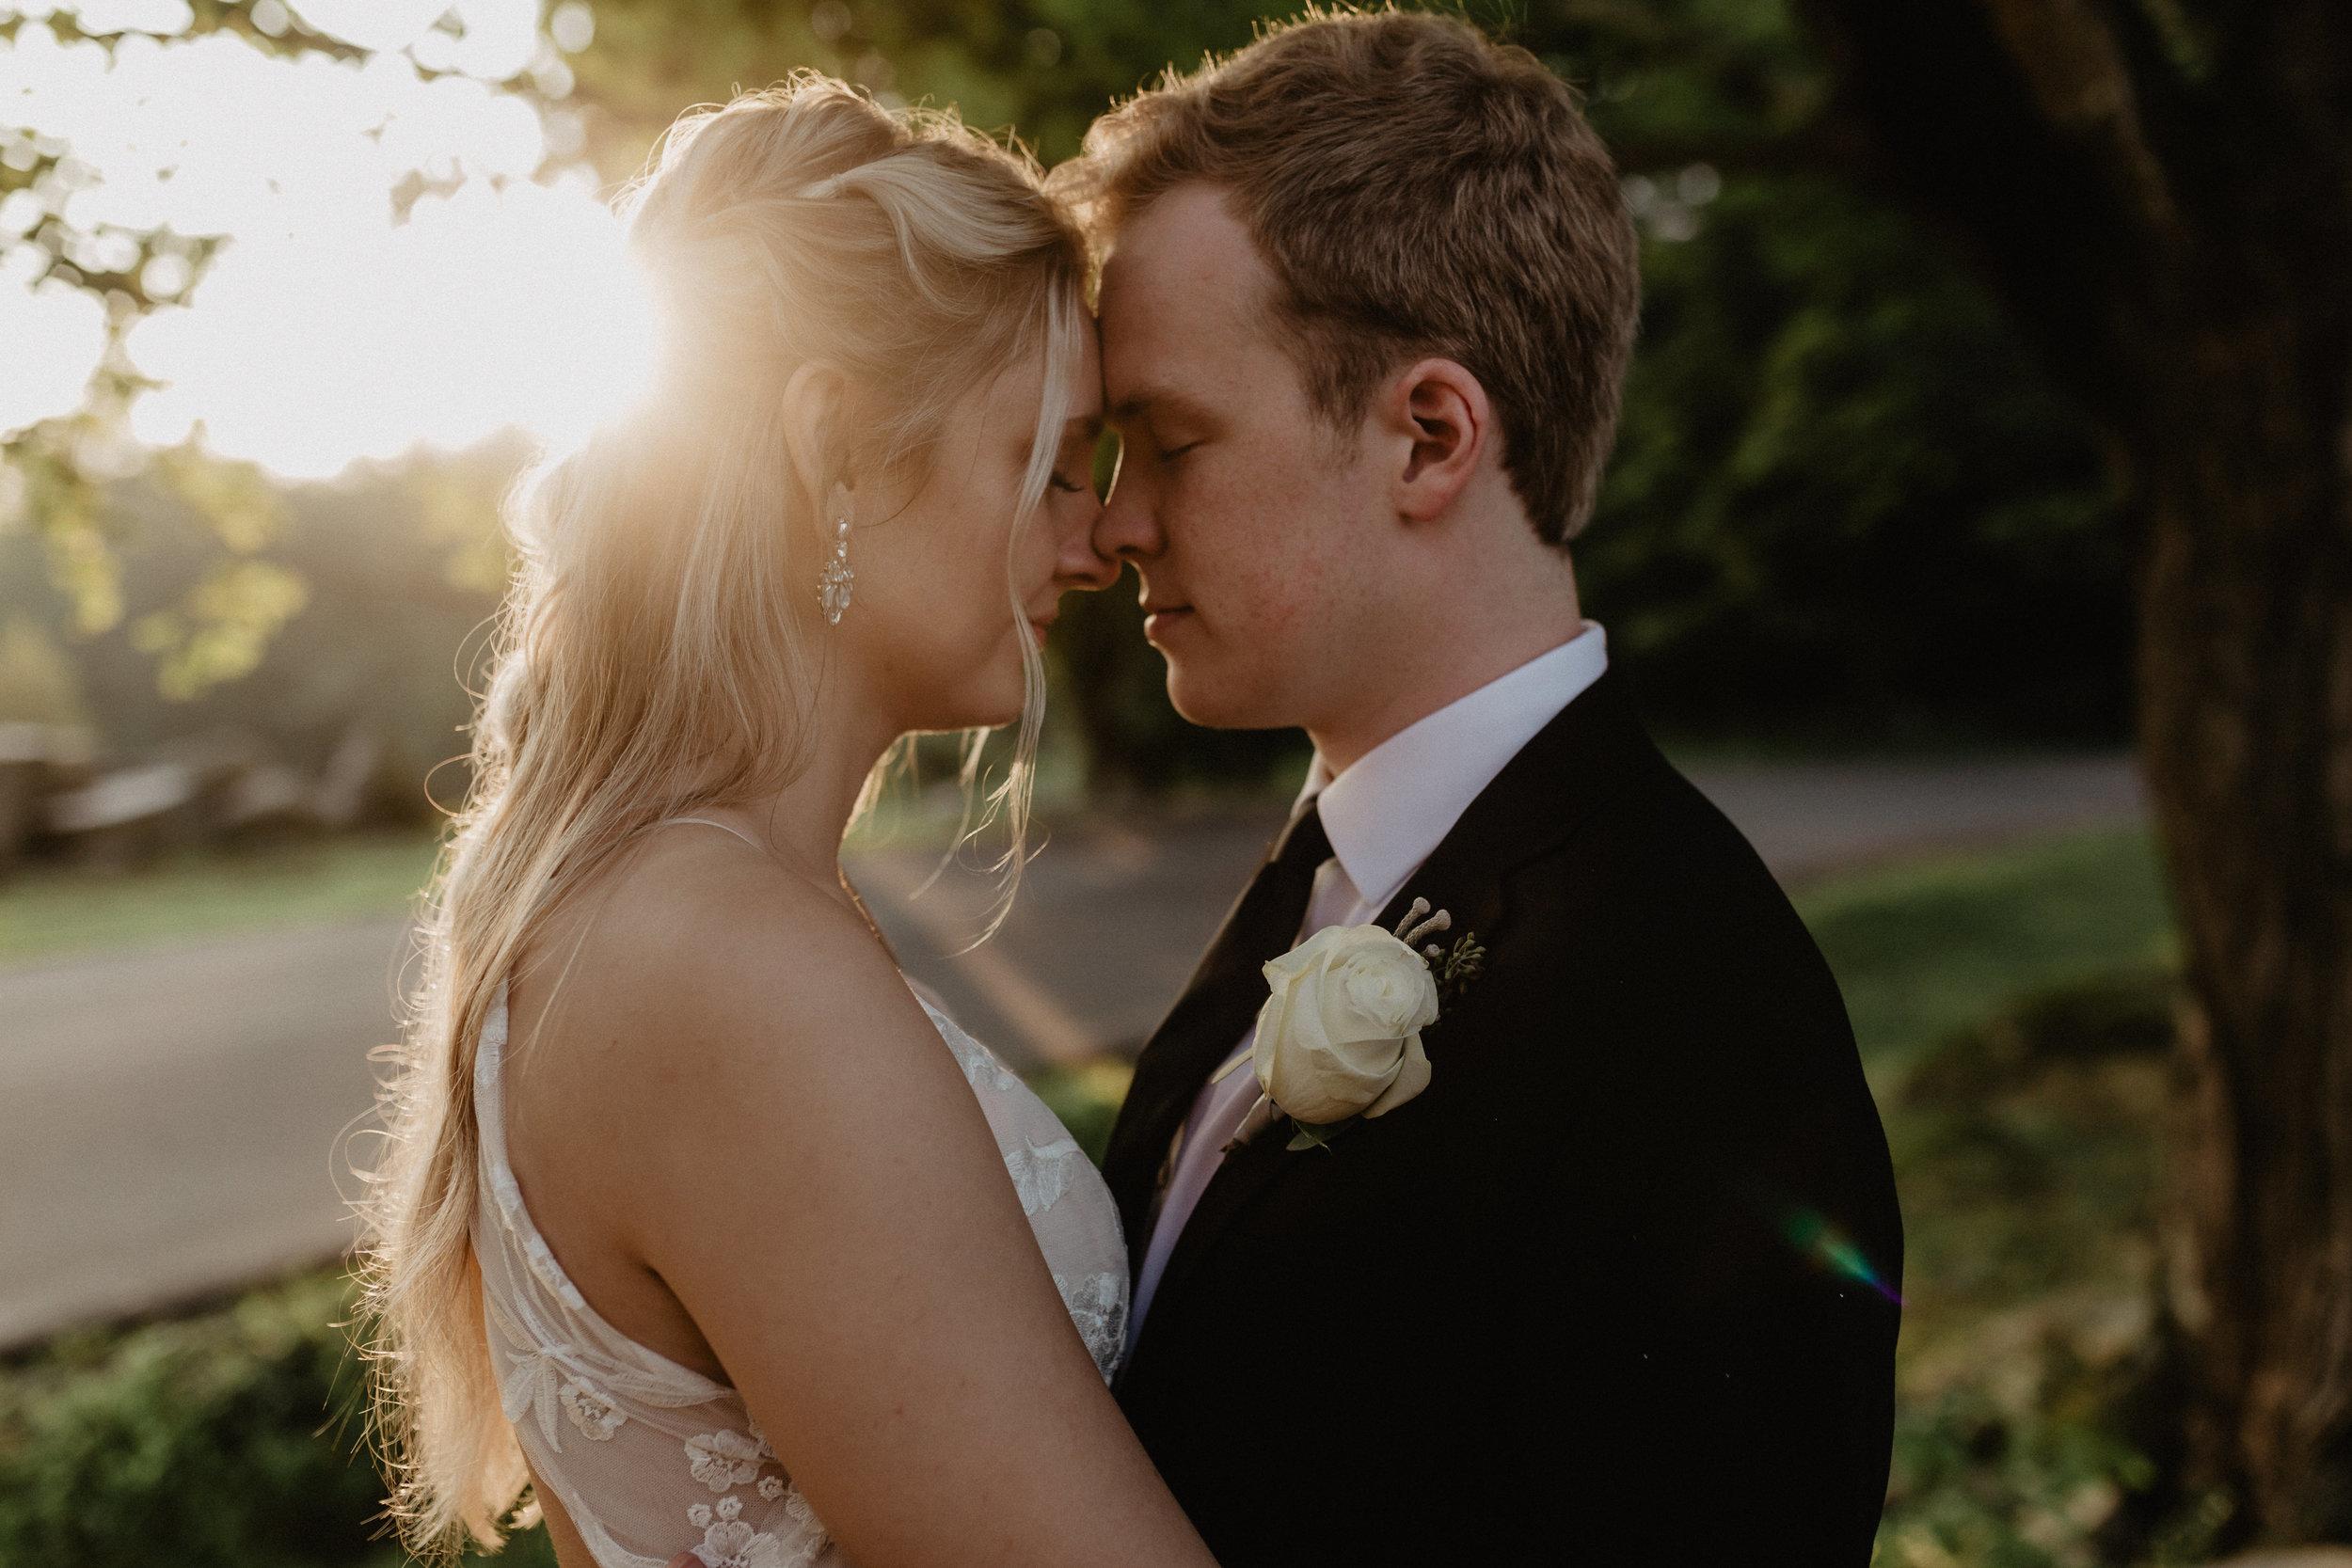 greywacke-meadows-wedding-74.jpg